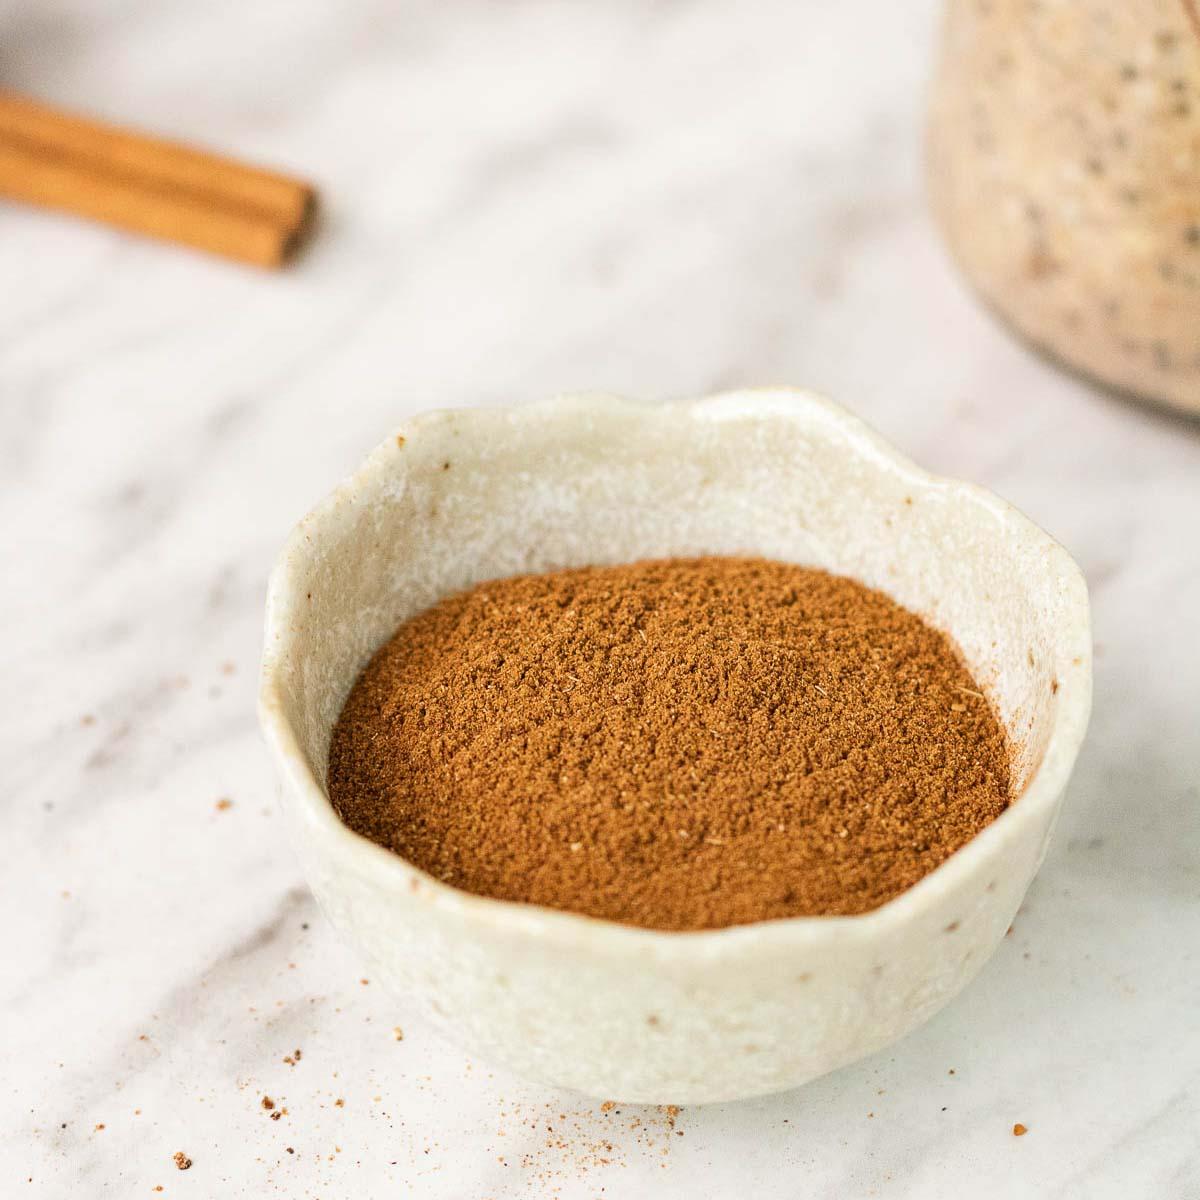 a spice blend in a bowl